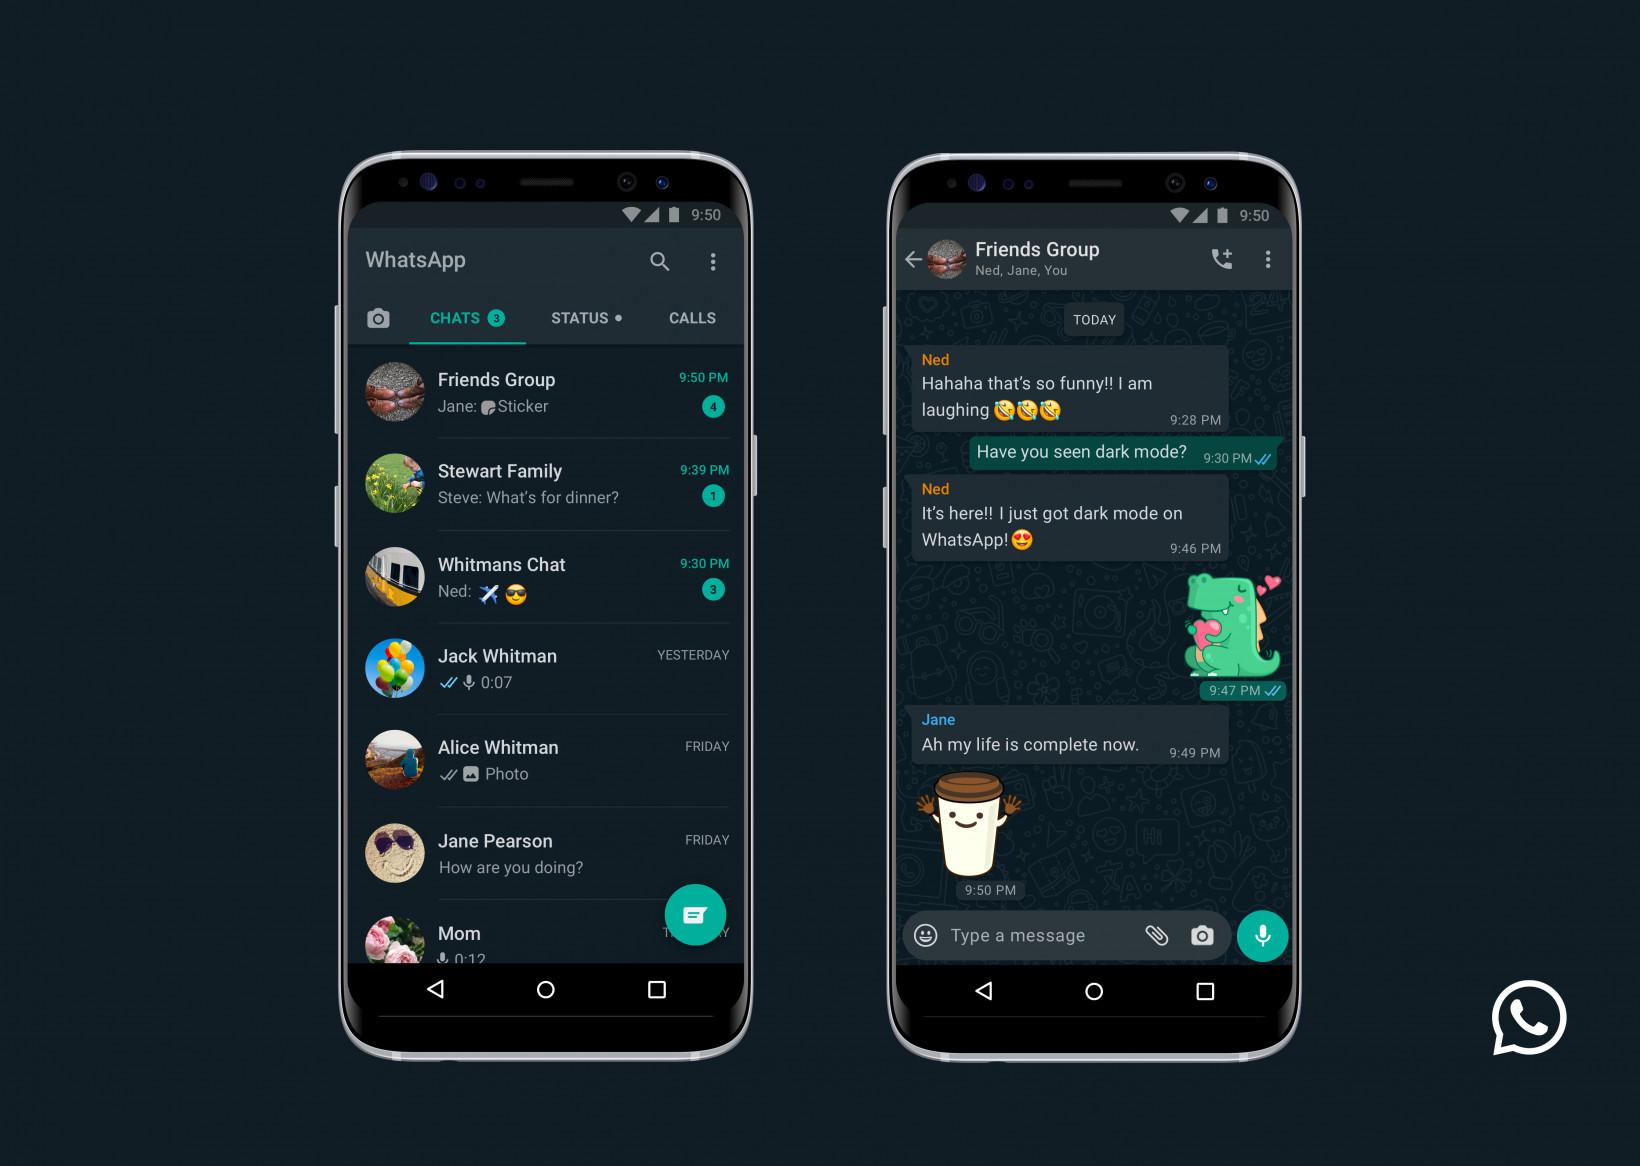 whatsapp-a-karanlik-mod-geliyor-1